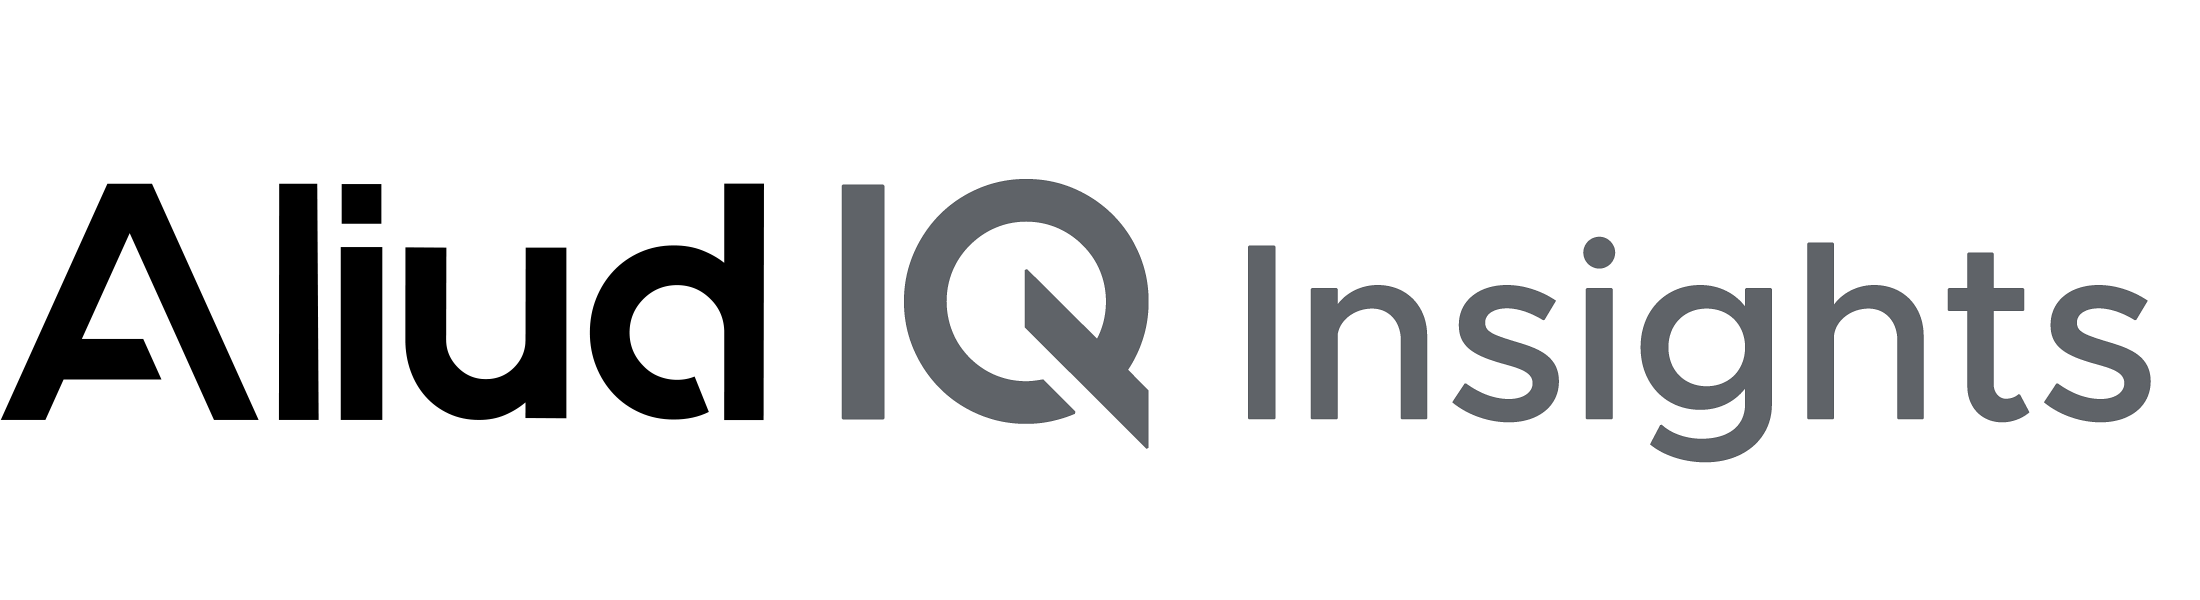 Aliud IQ Insights on transparent background.